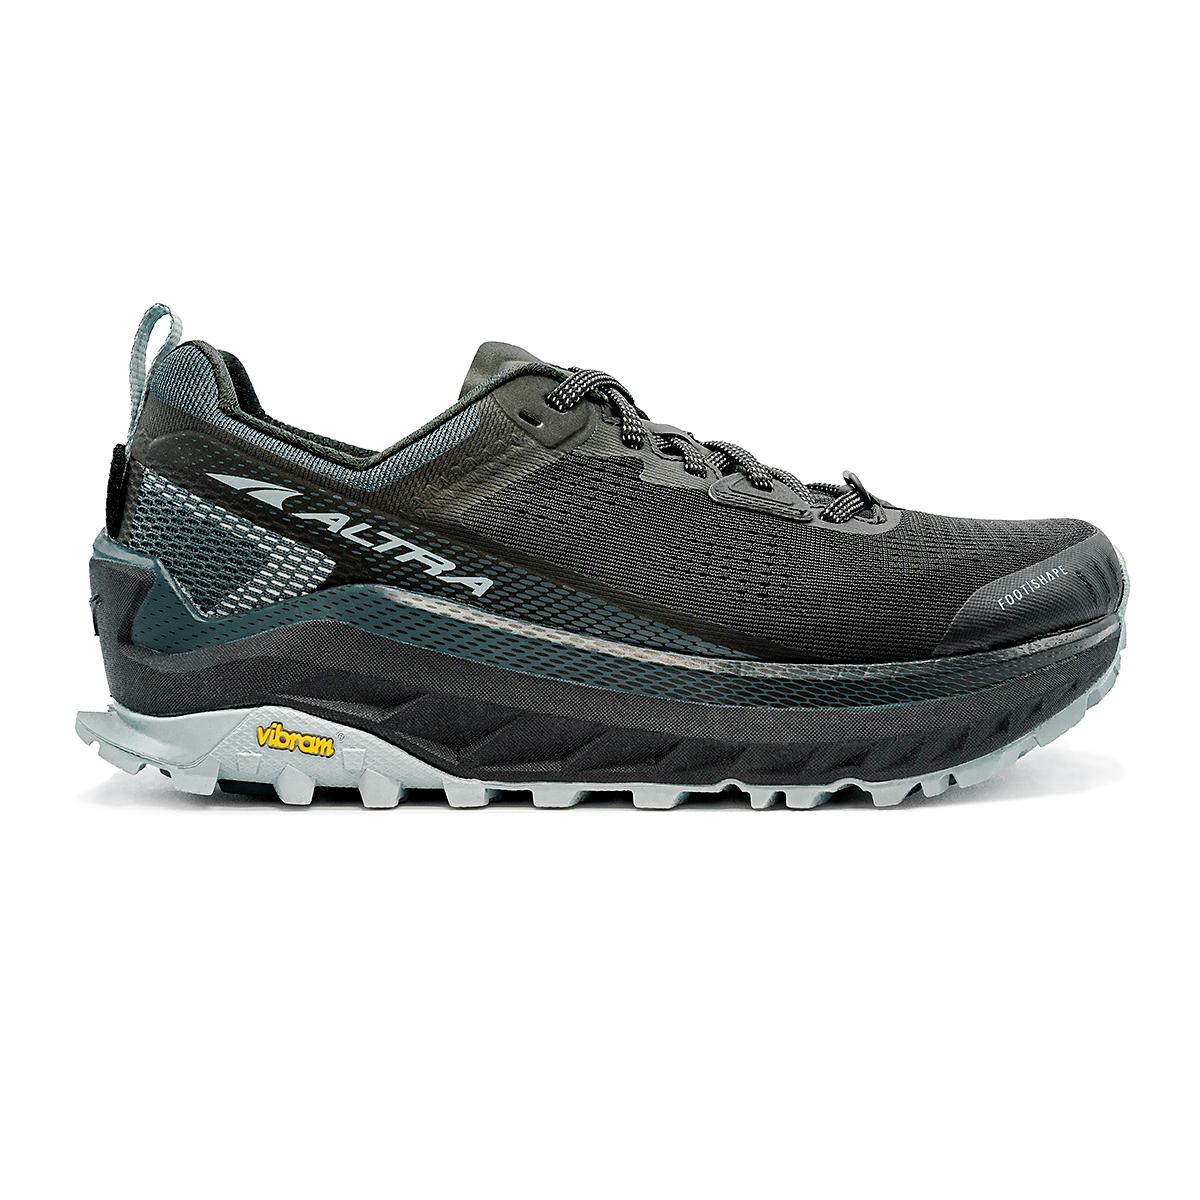 Women's Altra Olympus 4 Trail Running Shoe - Color: Black/Light Blue - Size: 5.5 - Width: Regular, Black/Light Blue, large, image 1